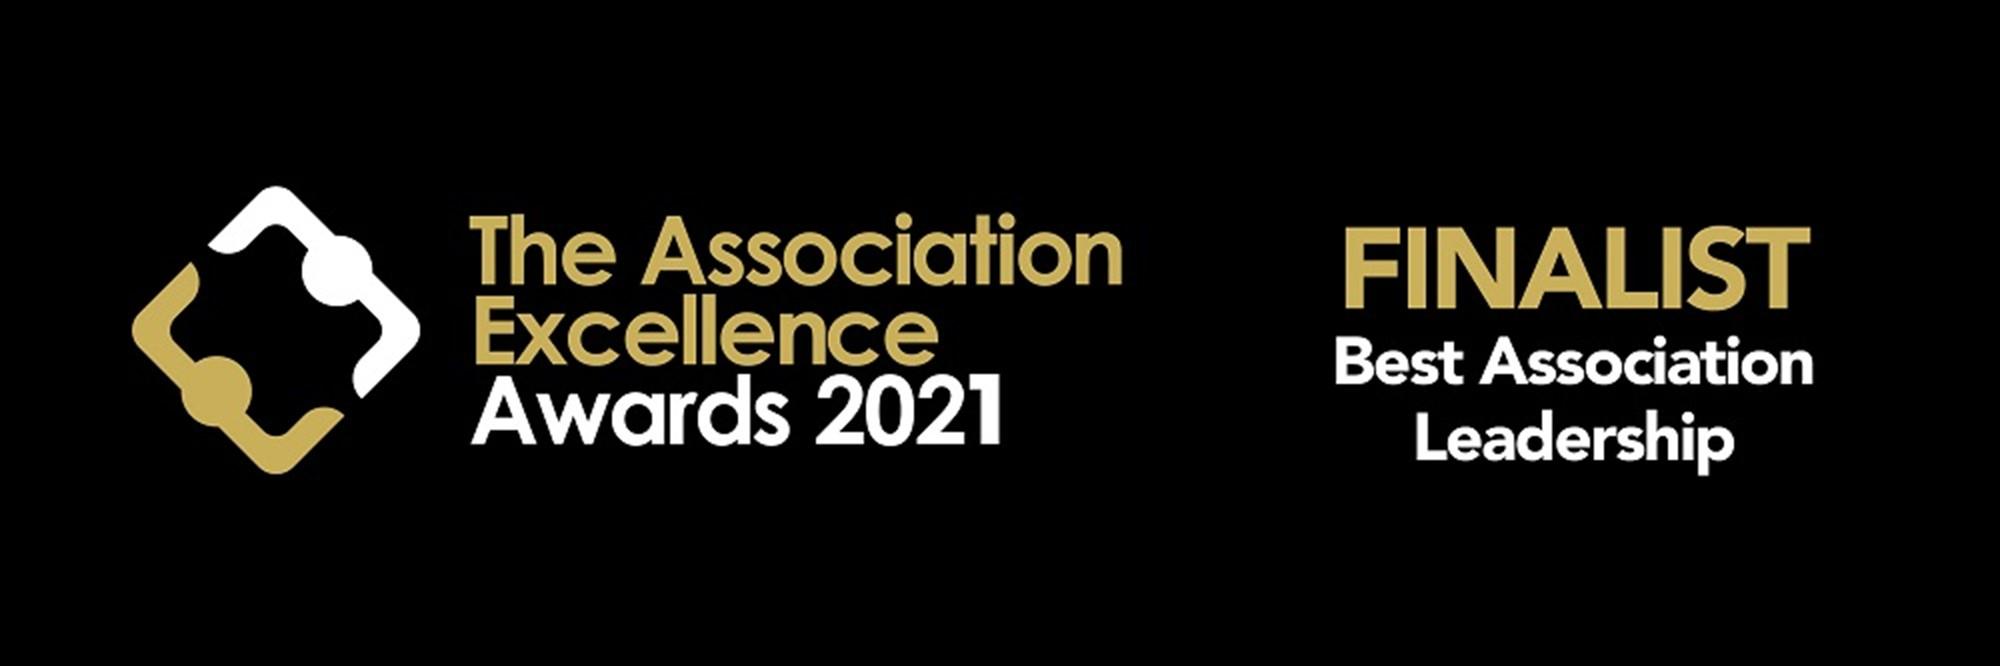 Best Association Leadership Finalist